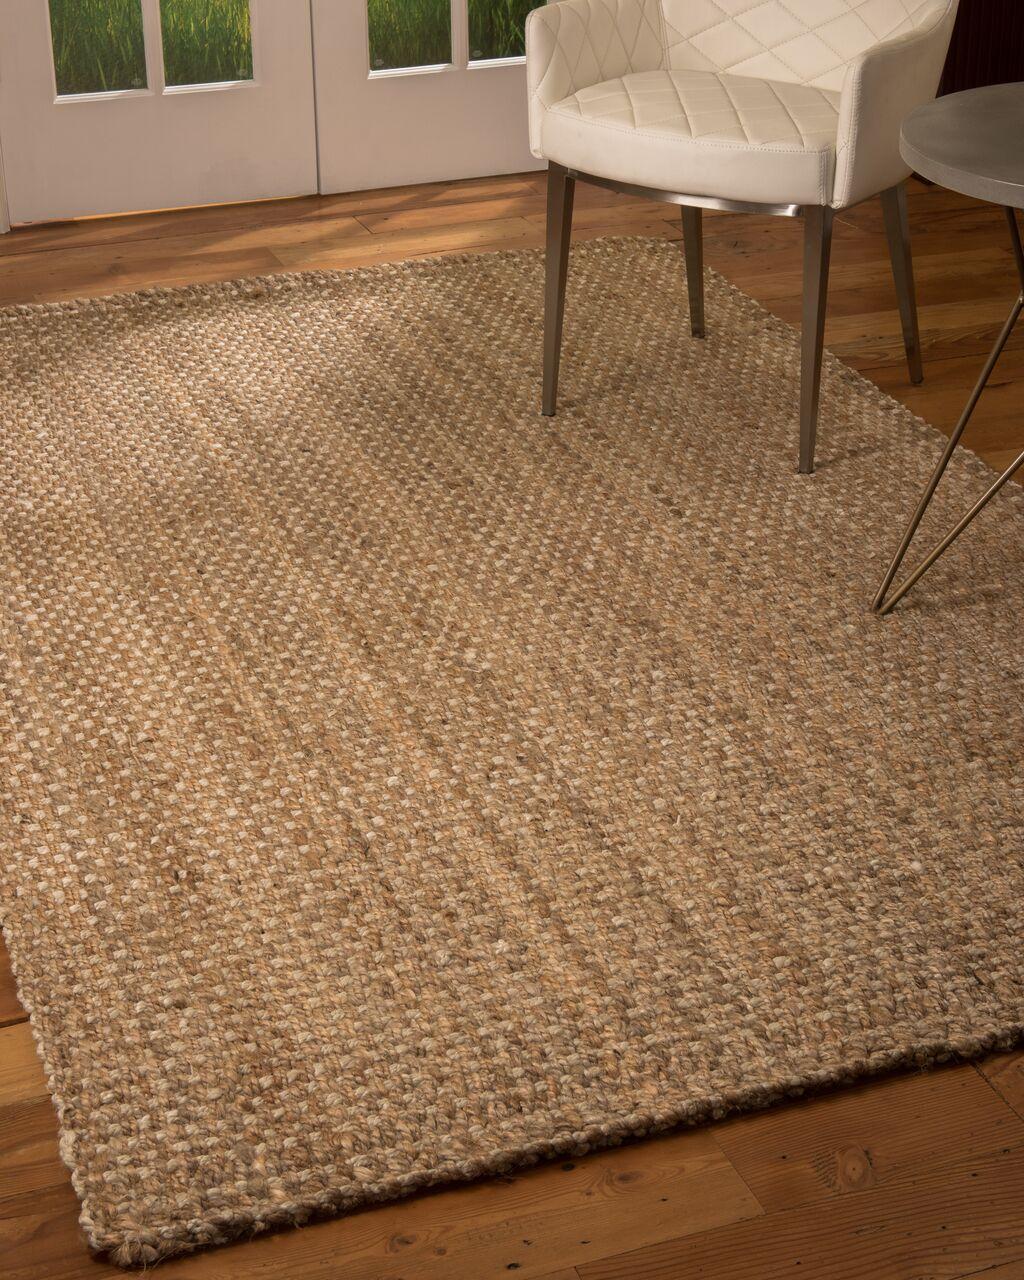 Modbury Hand-Loomed Brown Area Rug Rug Size: Rectangle 5' x 8'